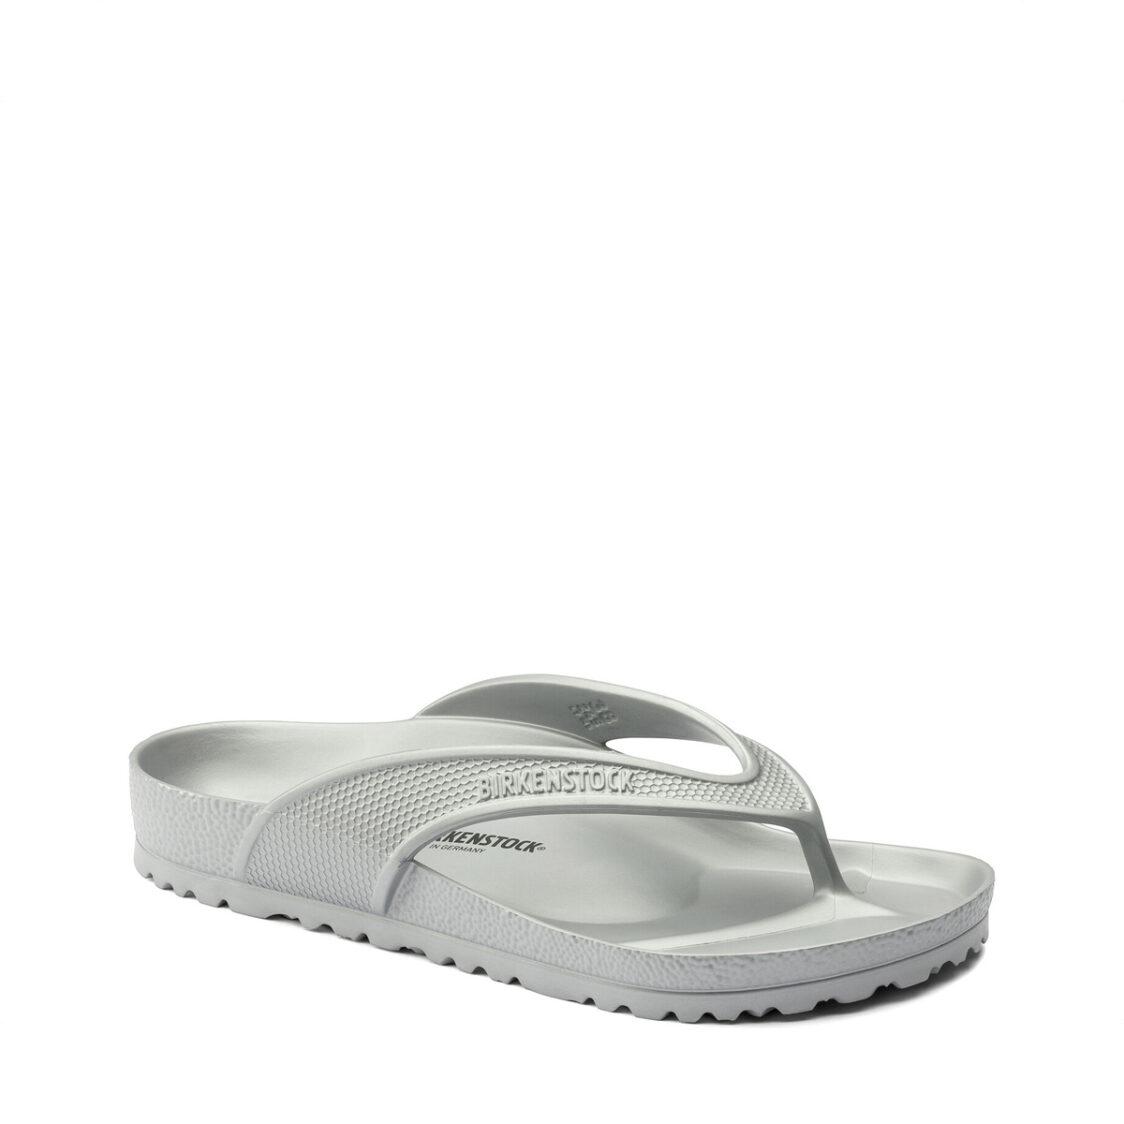 Birkenstock Honolulu EVA Unisex Regular Width Sandals Metallic Silver